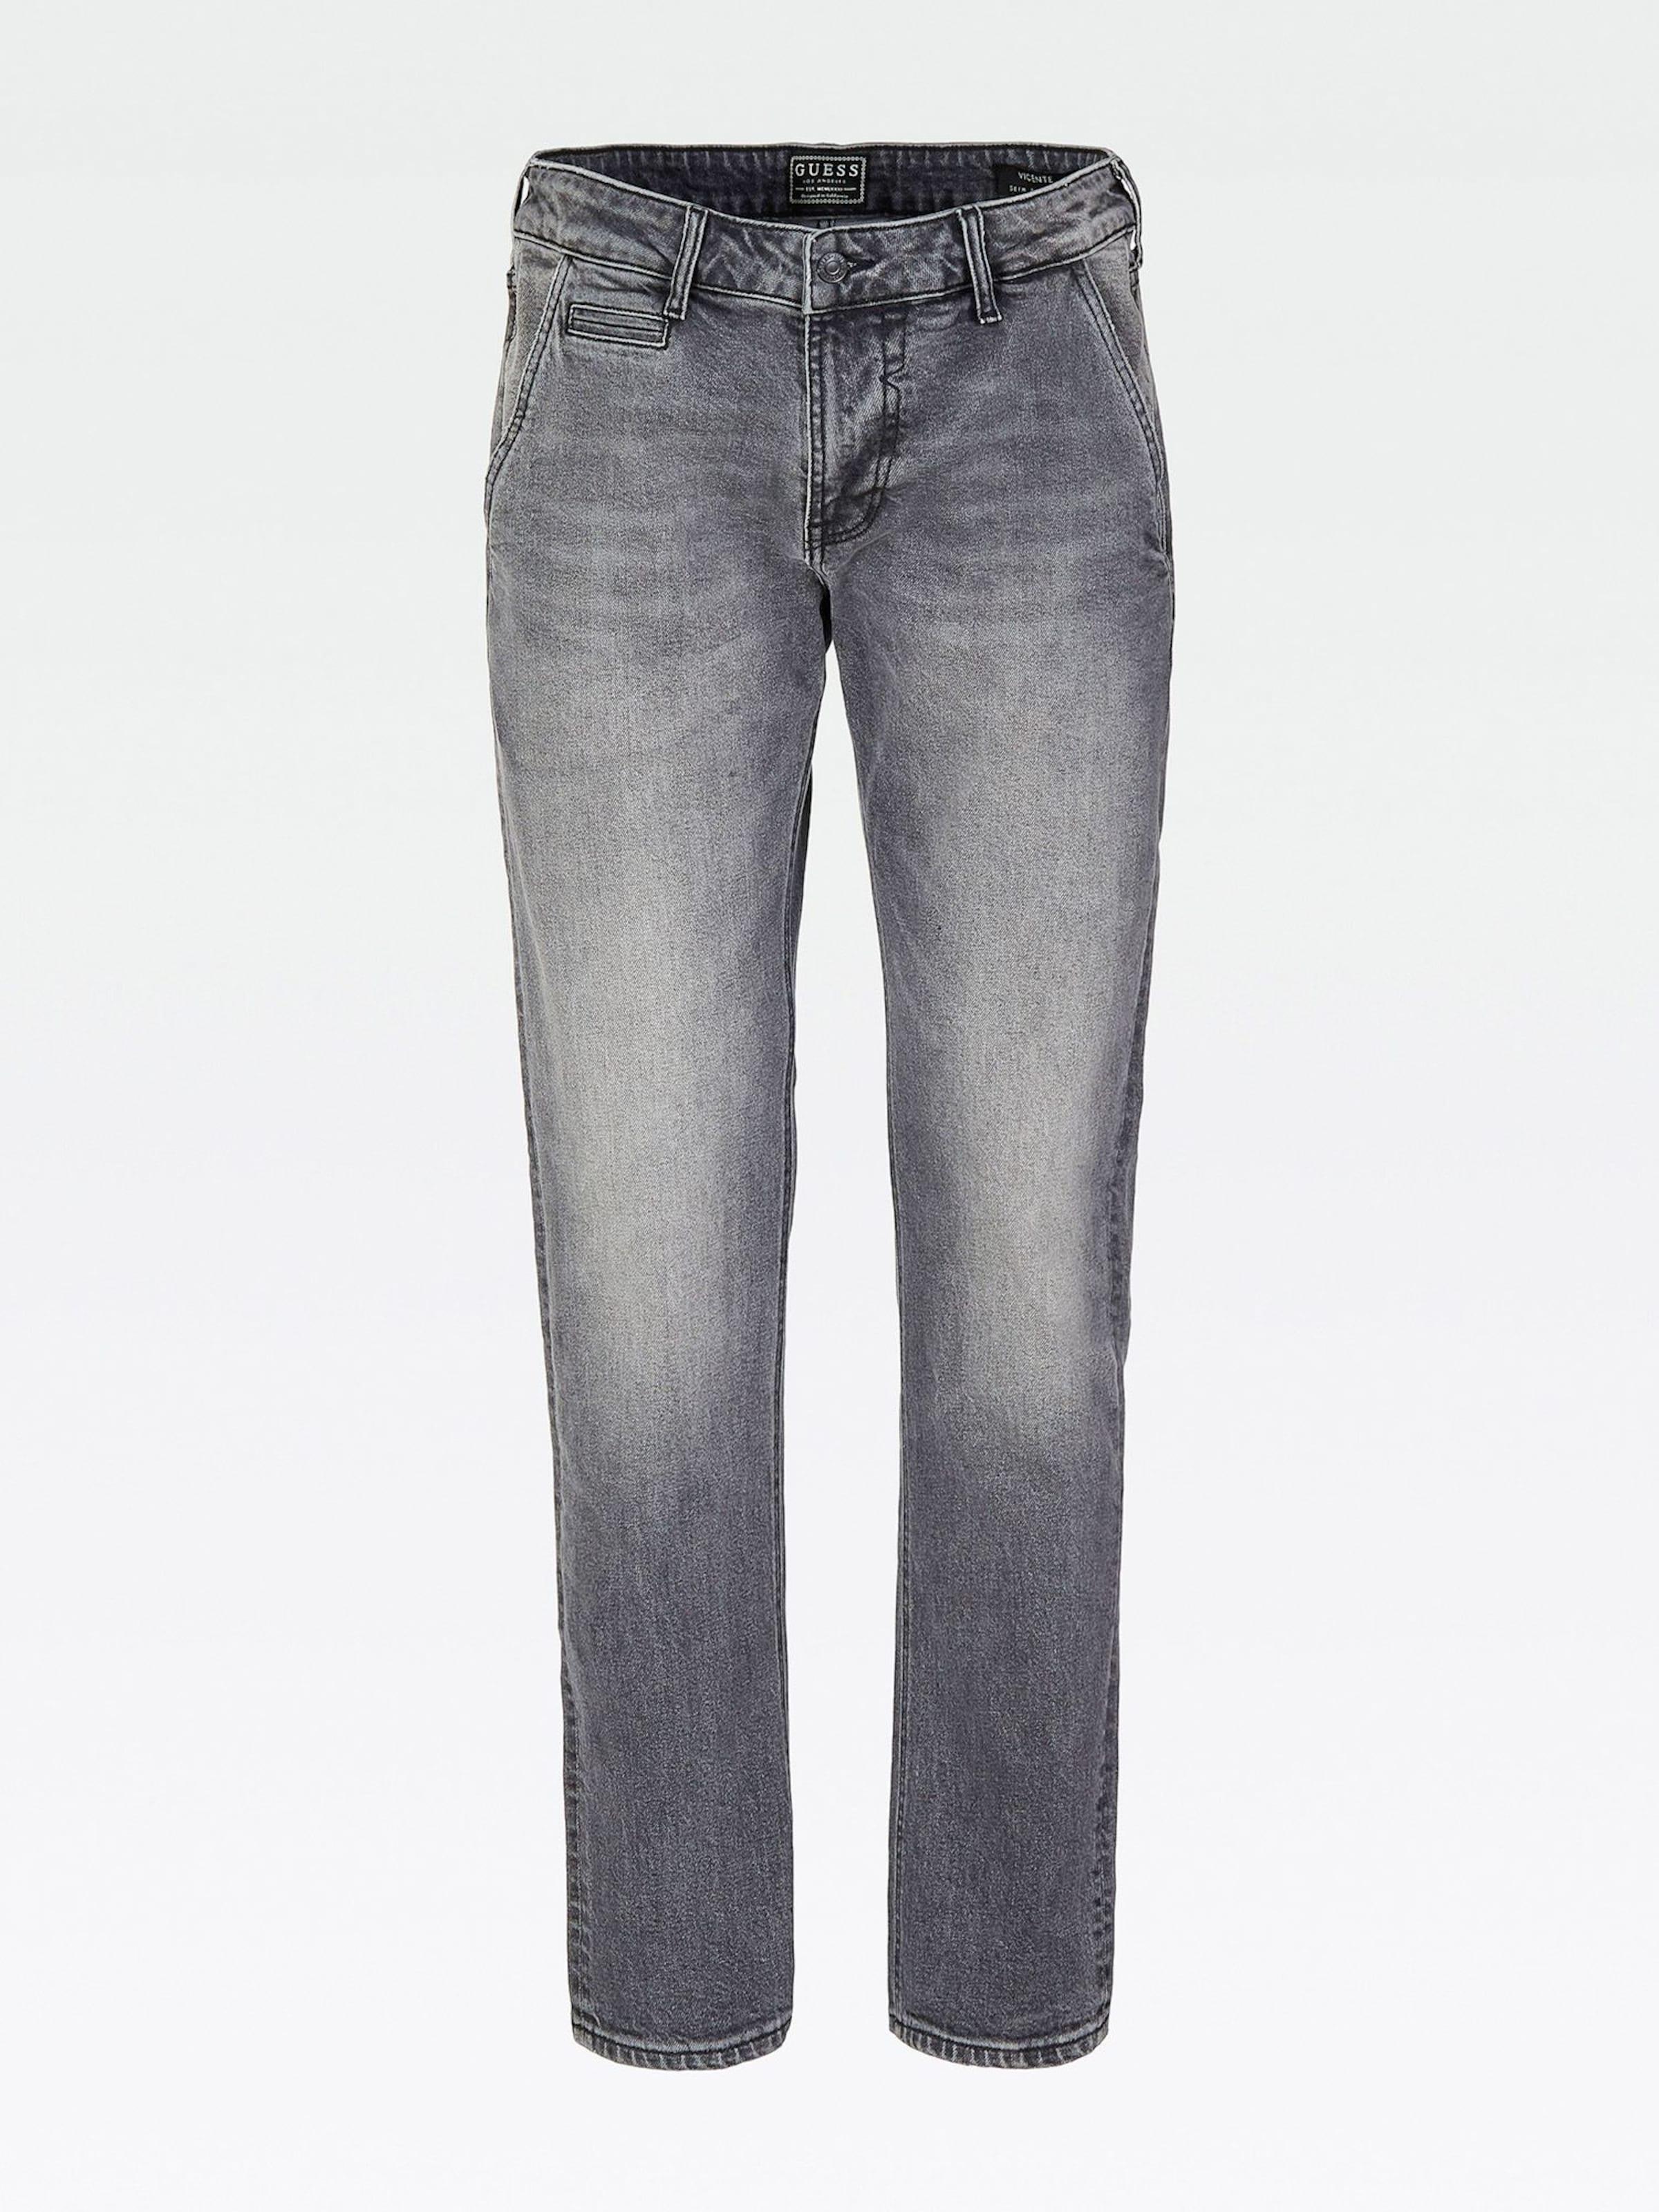 In Jeans Denim Guess Grey Guess Jeans In Guess Grey Denim TK1JlFc3